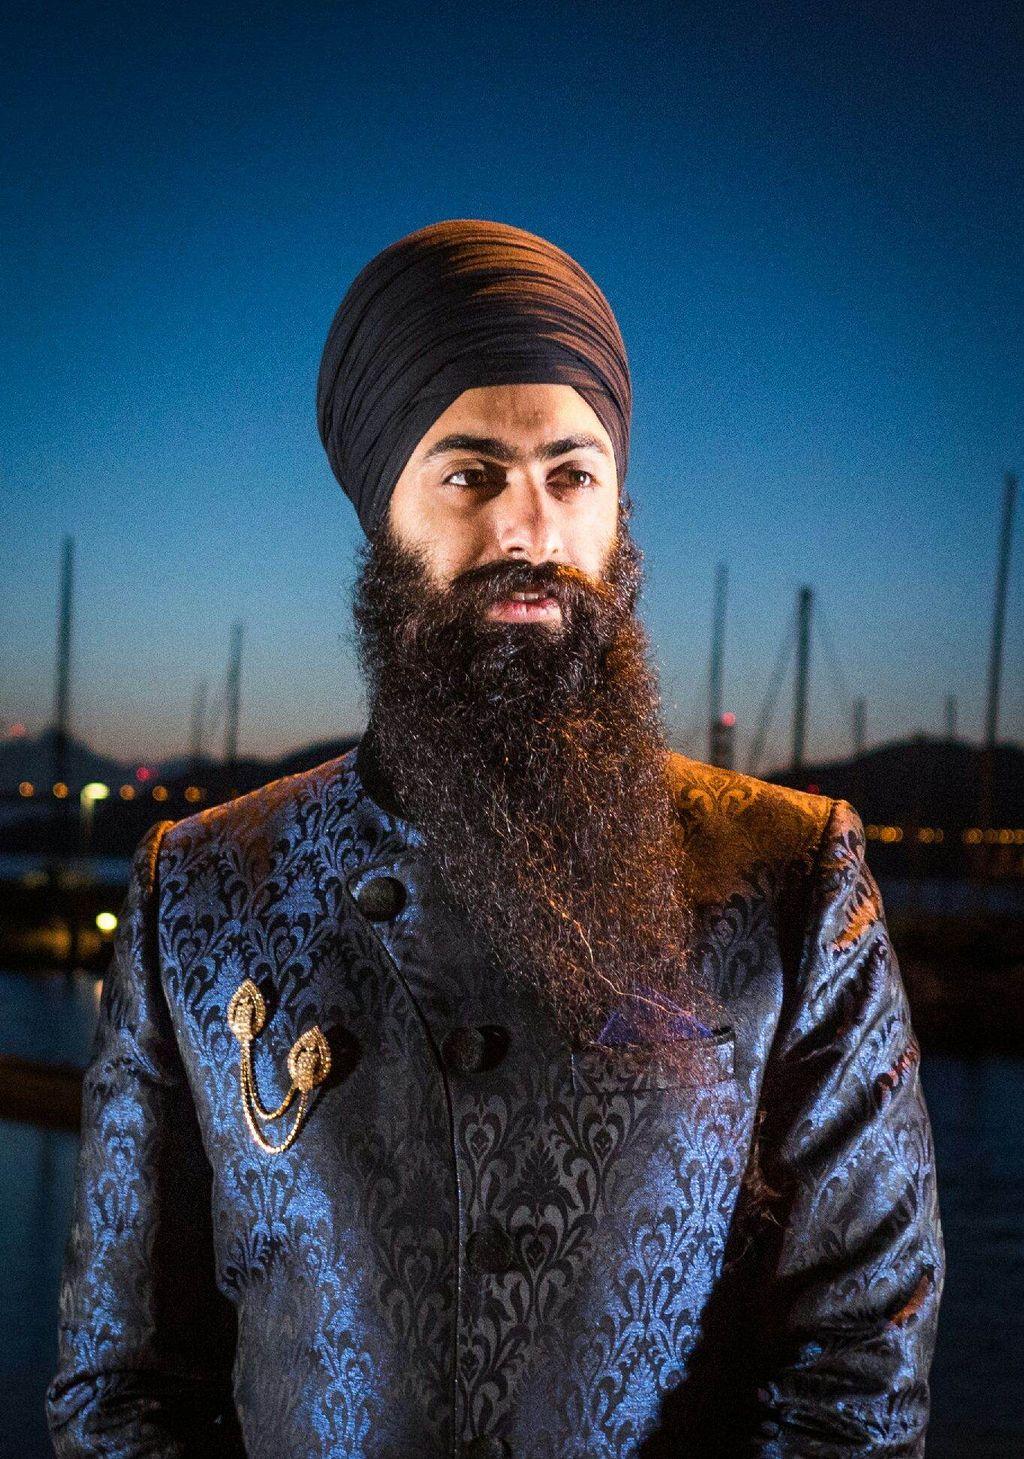 Amasingh - The Amazing Singh